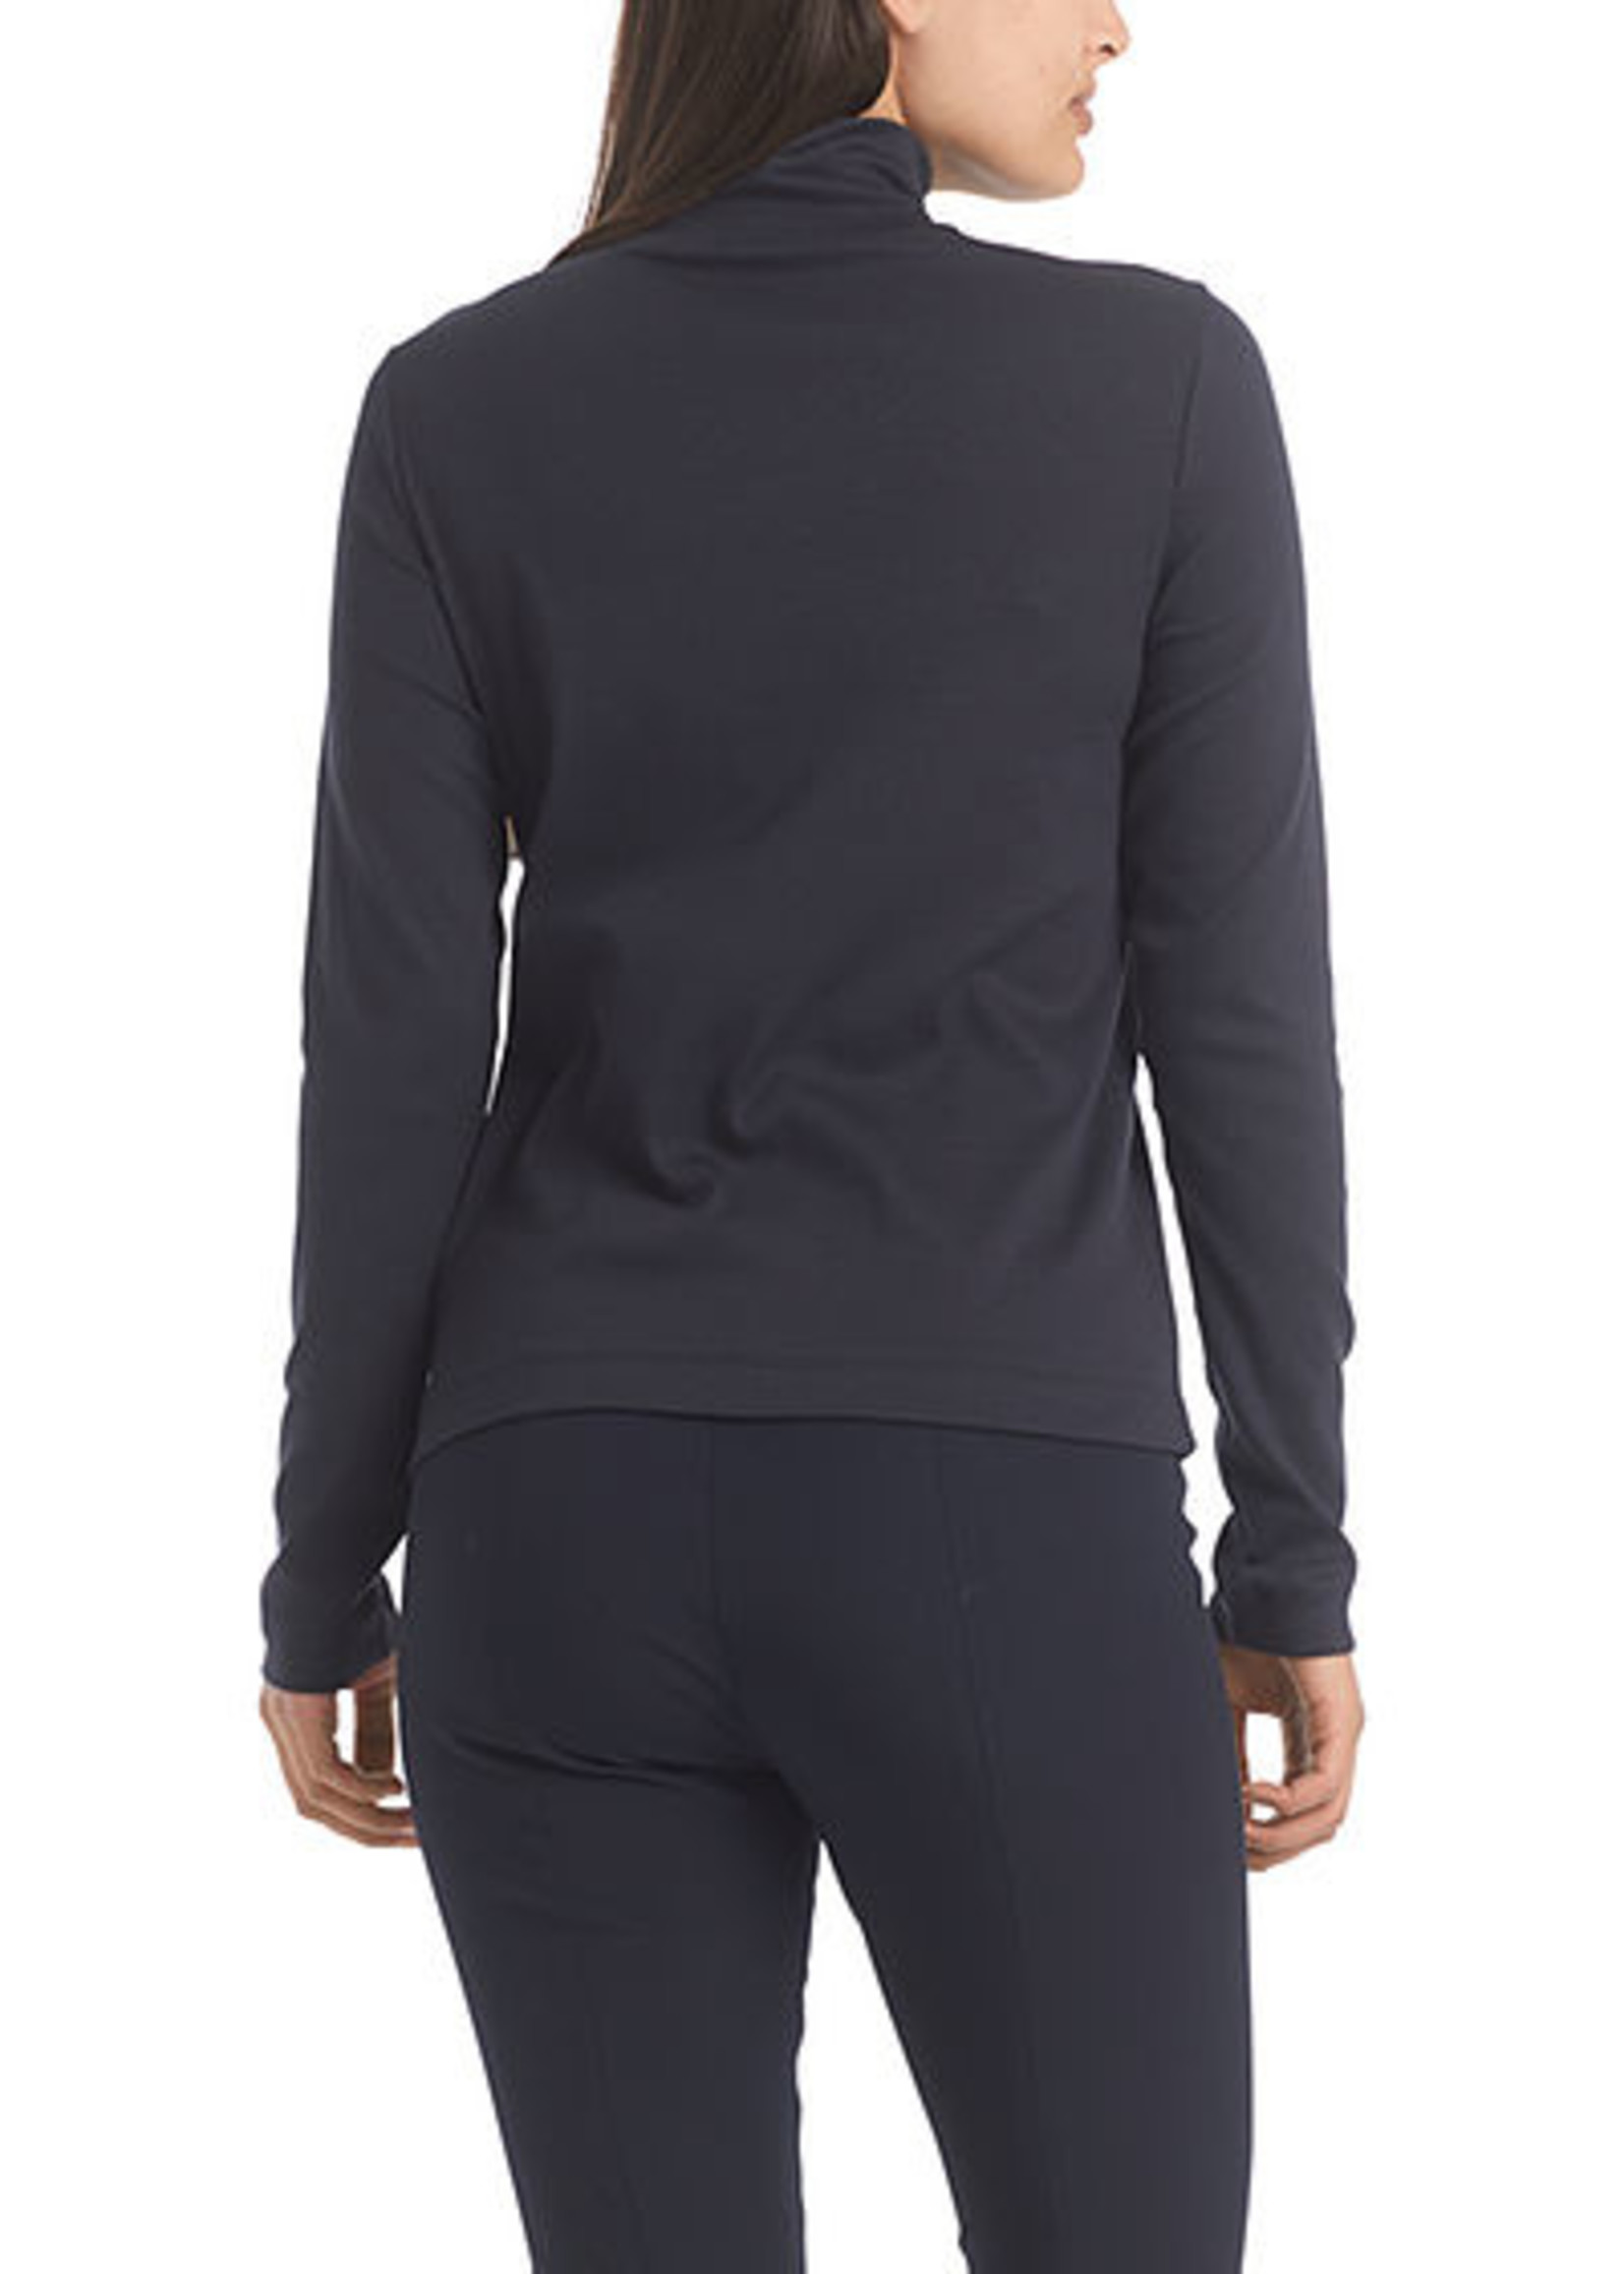 Marccain Sports T-shirt RS 48.61 J35 midnight blue